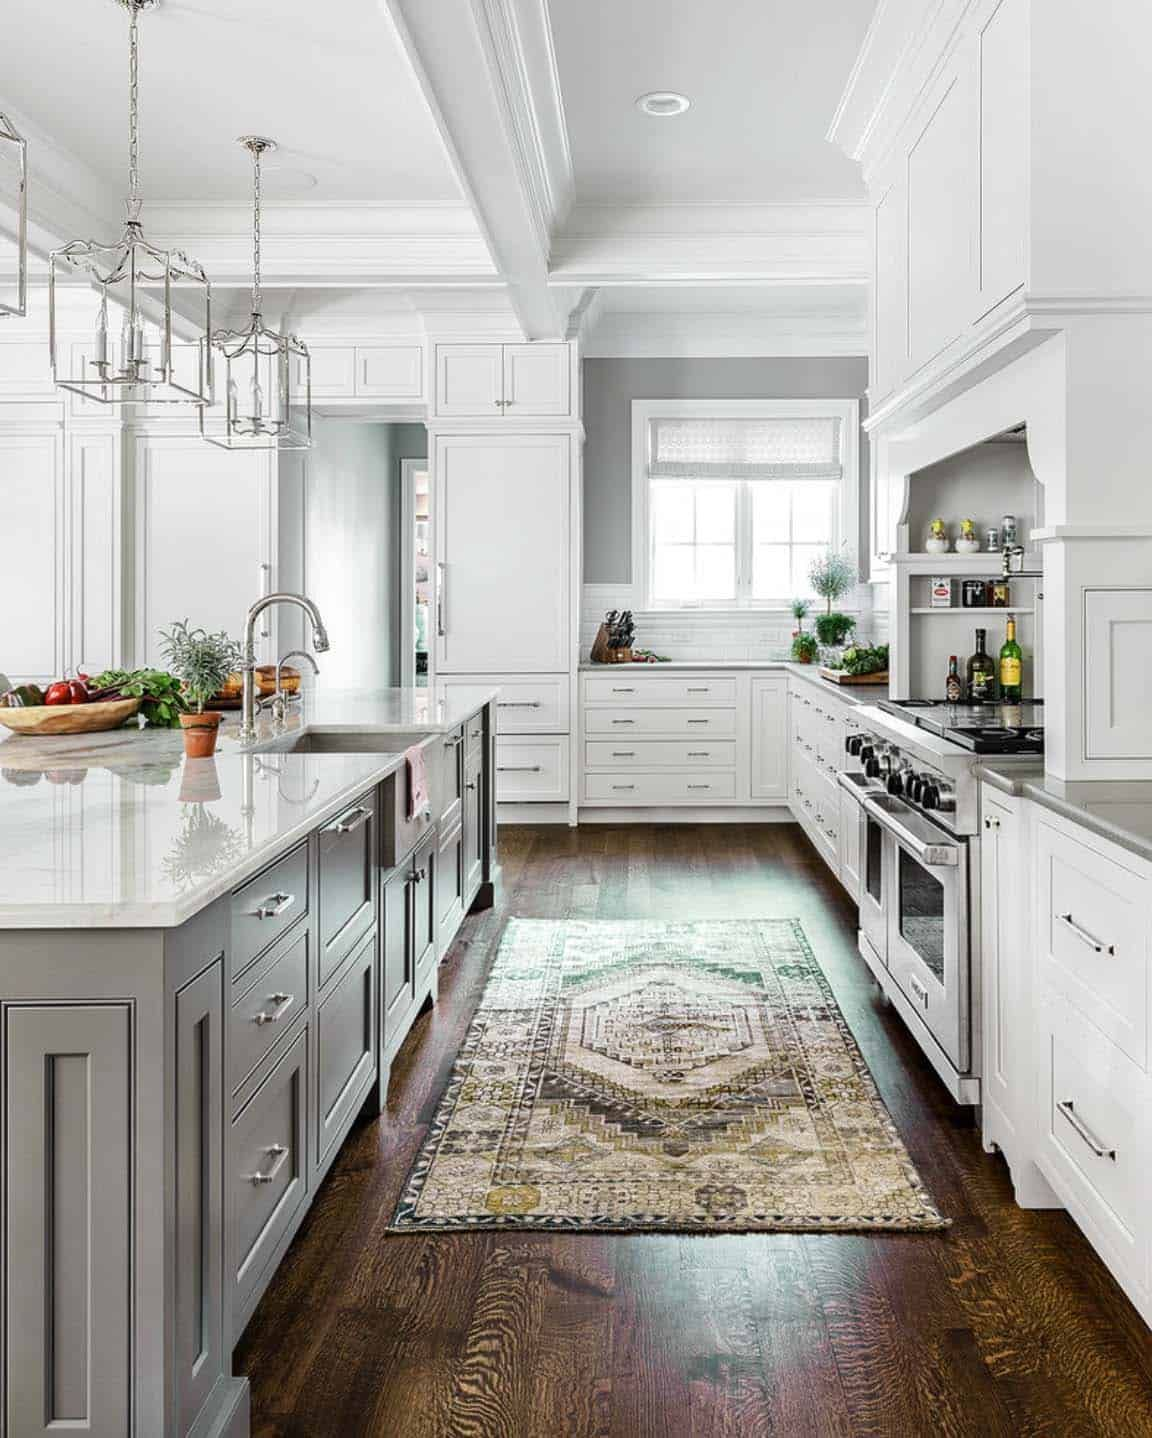 55 Most Fabulous Kitchens Showcased On One Kindesign For 2018 Dream Kitchens Design Farmhouse Kitchen Design Kitchen Cabinet Design